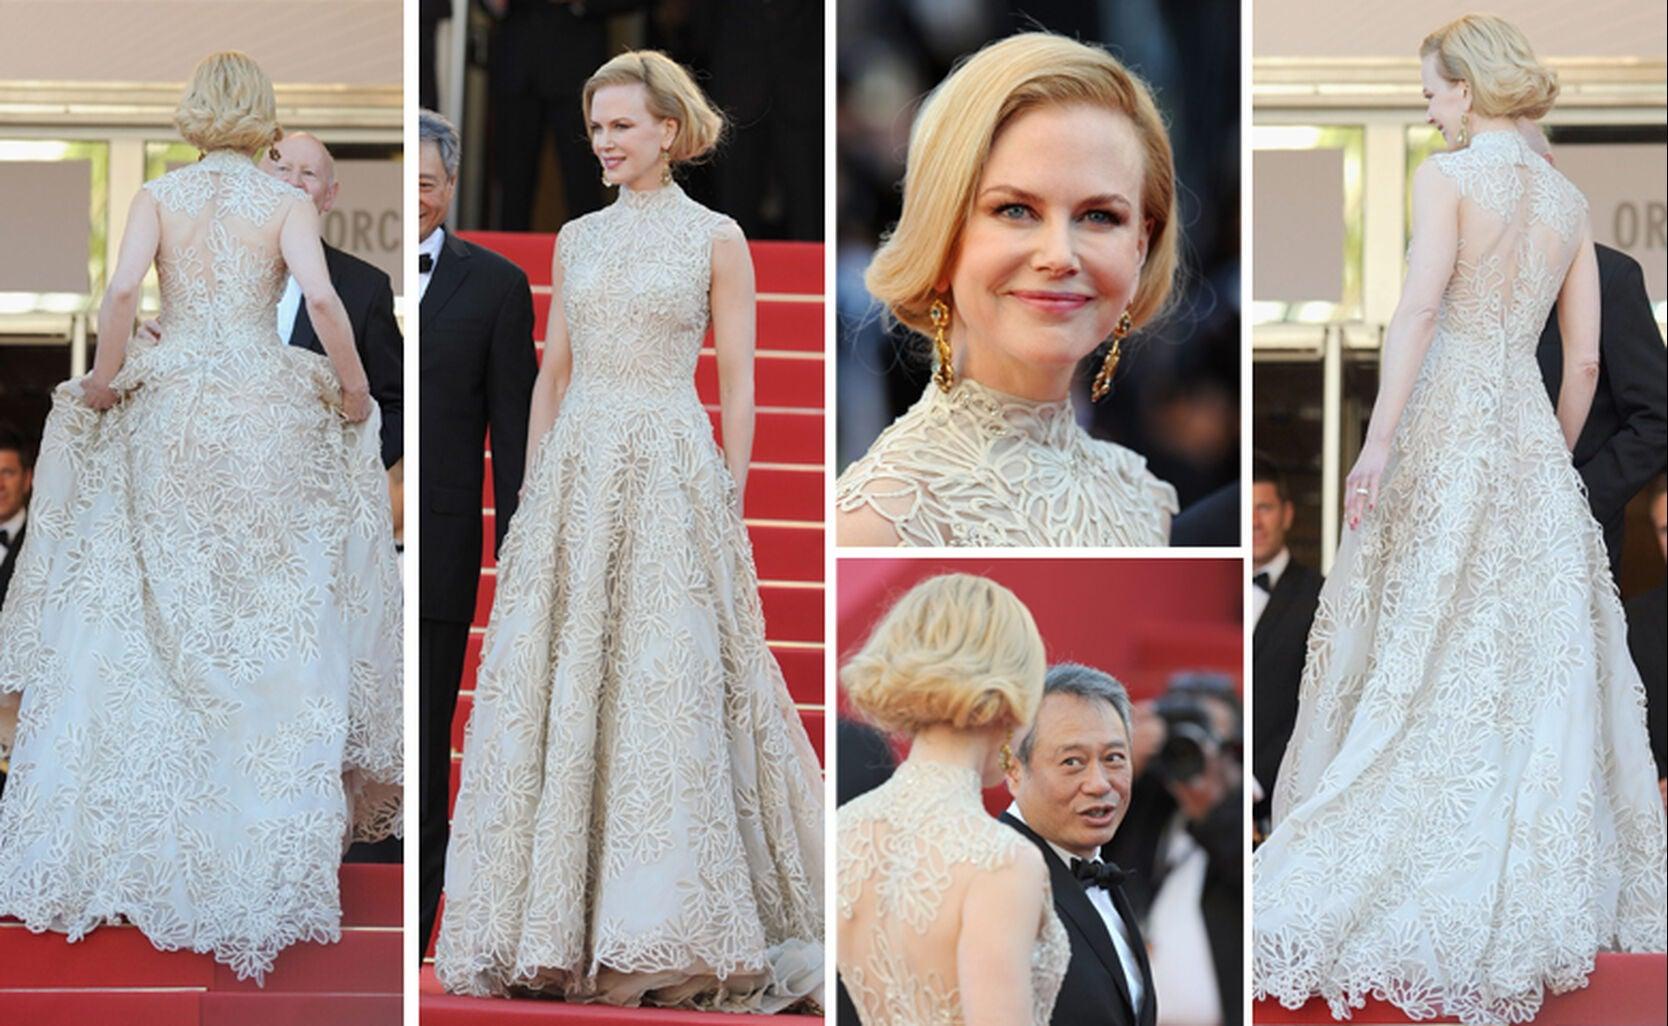 Nicole Kidman Balenciaga Wedding Dresses: Nicole Kidman & Cannes